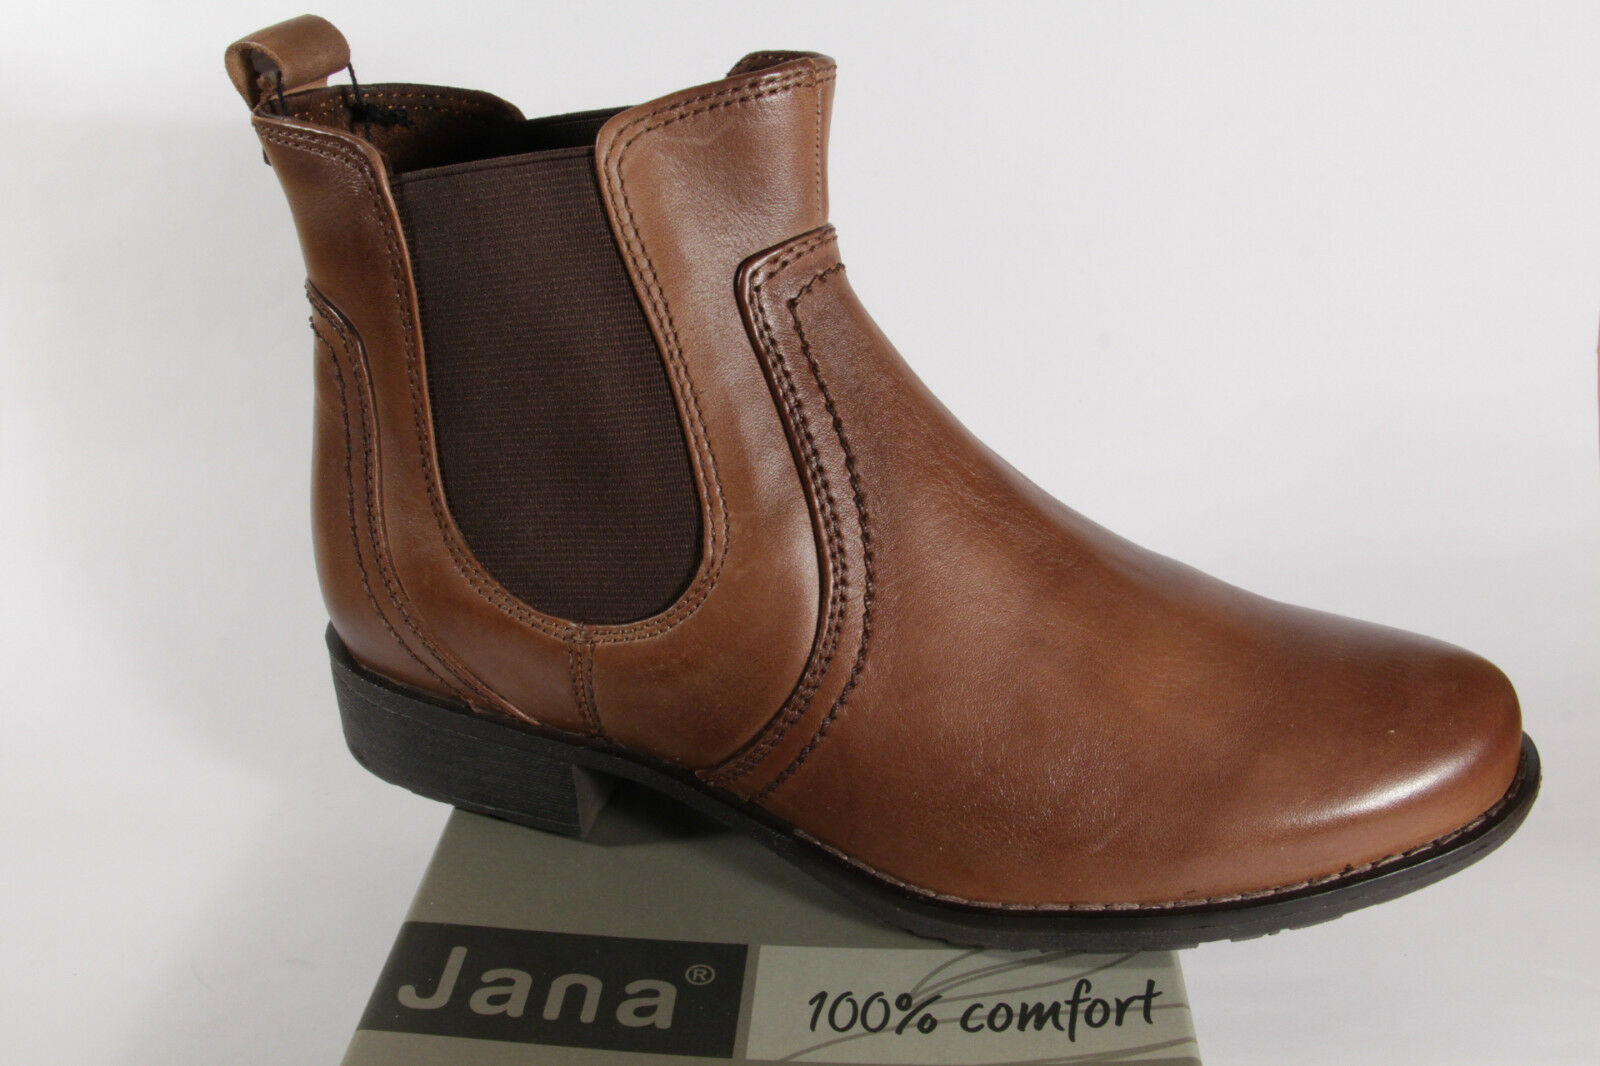 best sneakers 62113 b2d24 Jana 25414 Damen Stiefel, Stiefeletten Boots Echtleder braun NEU!